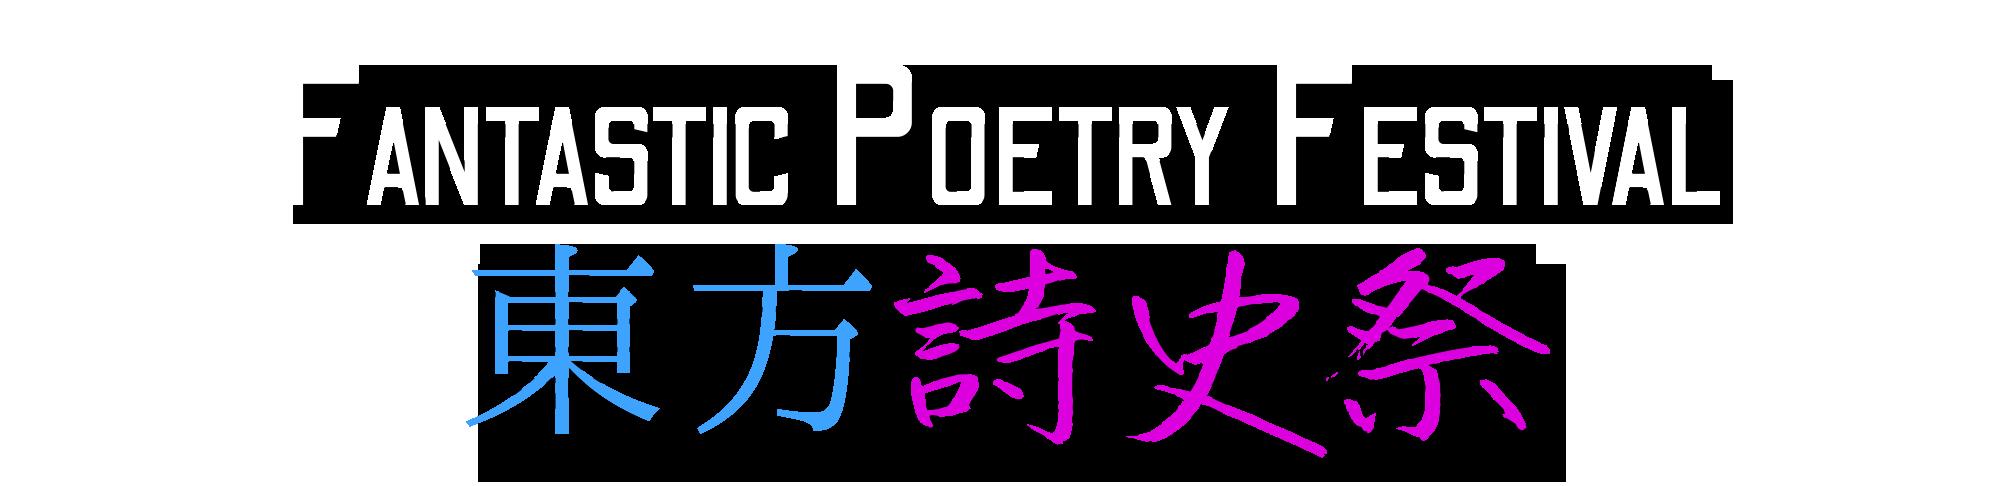 Fantastic Poetry Festival